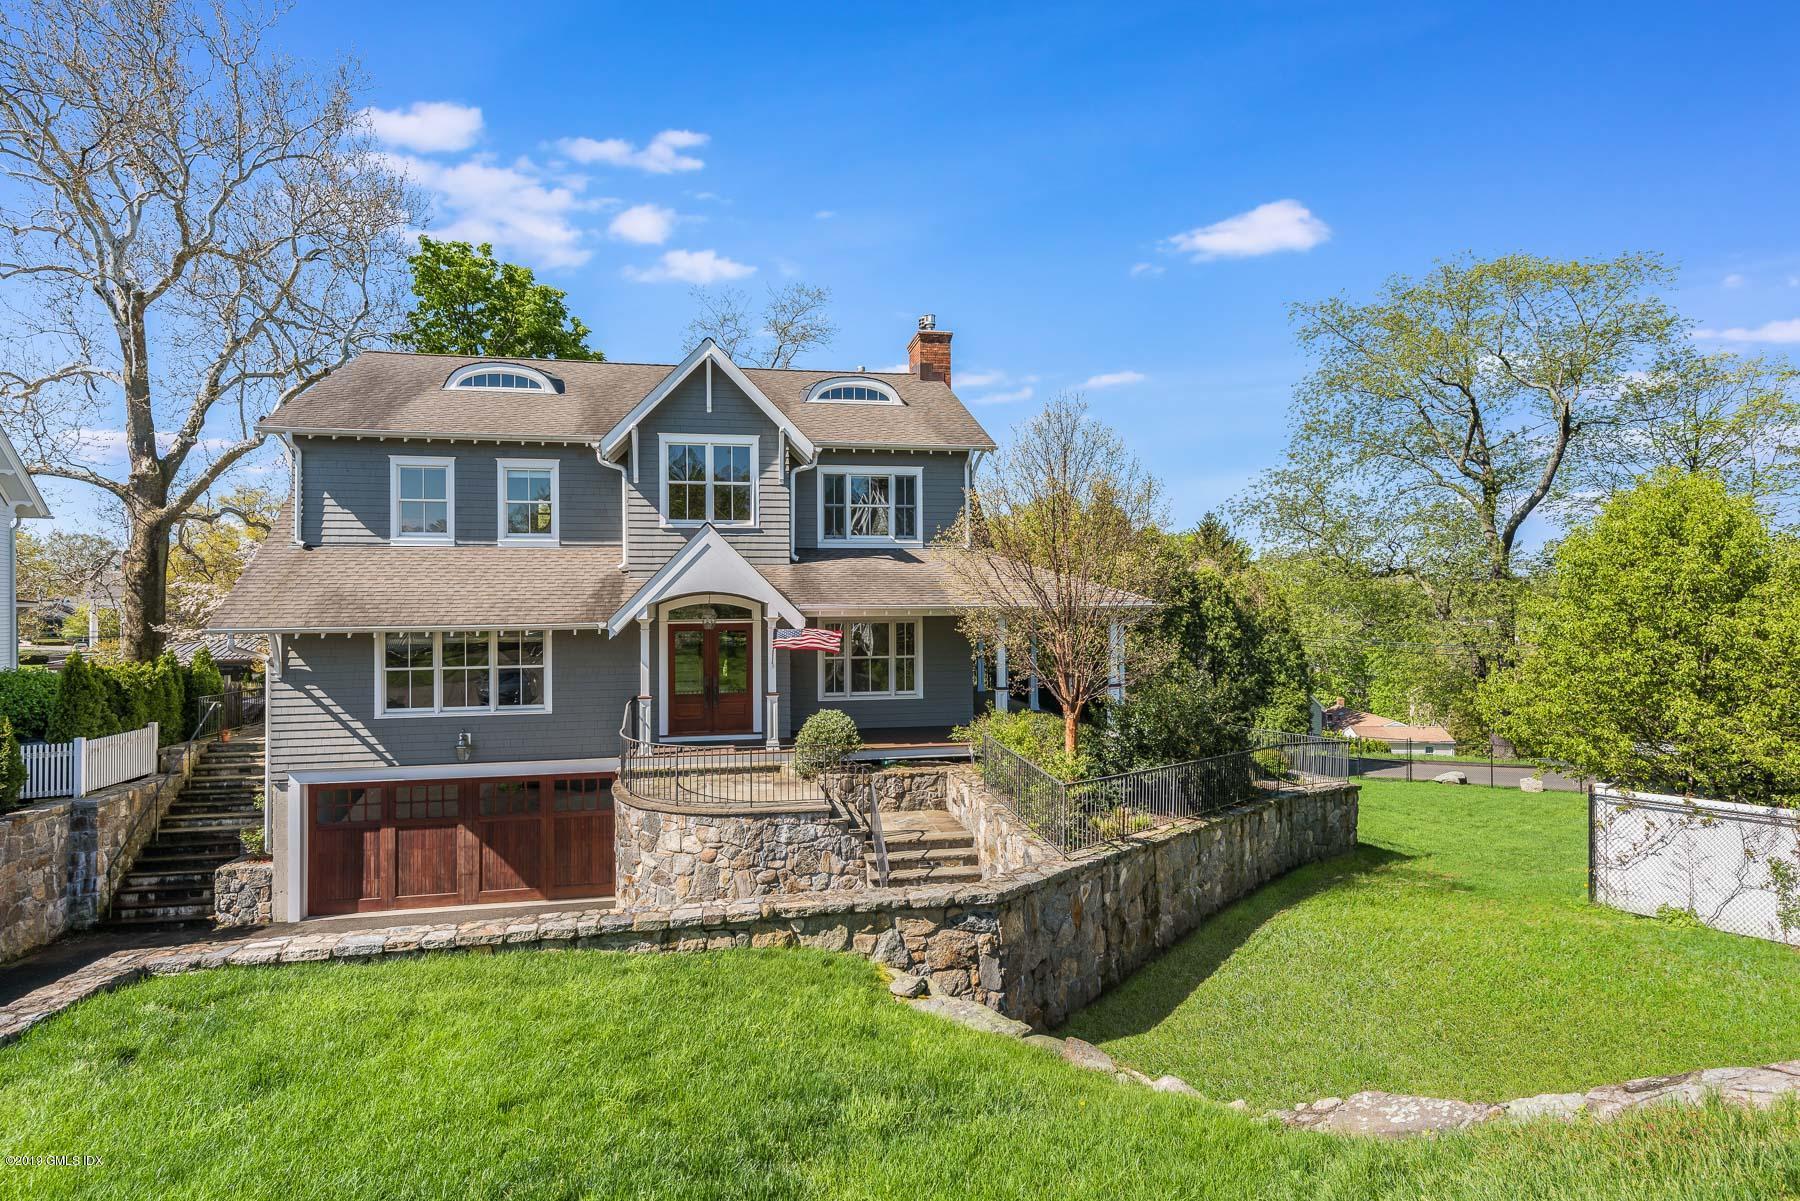 5 Finney Knoll Lane,Riverside,Connecticut 06878,4 Bedrooms Bedrooms,4 BathroomsBathrooms,Single family,Finney Knoll,106601